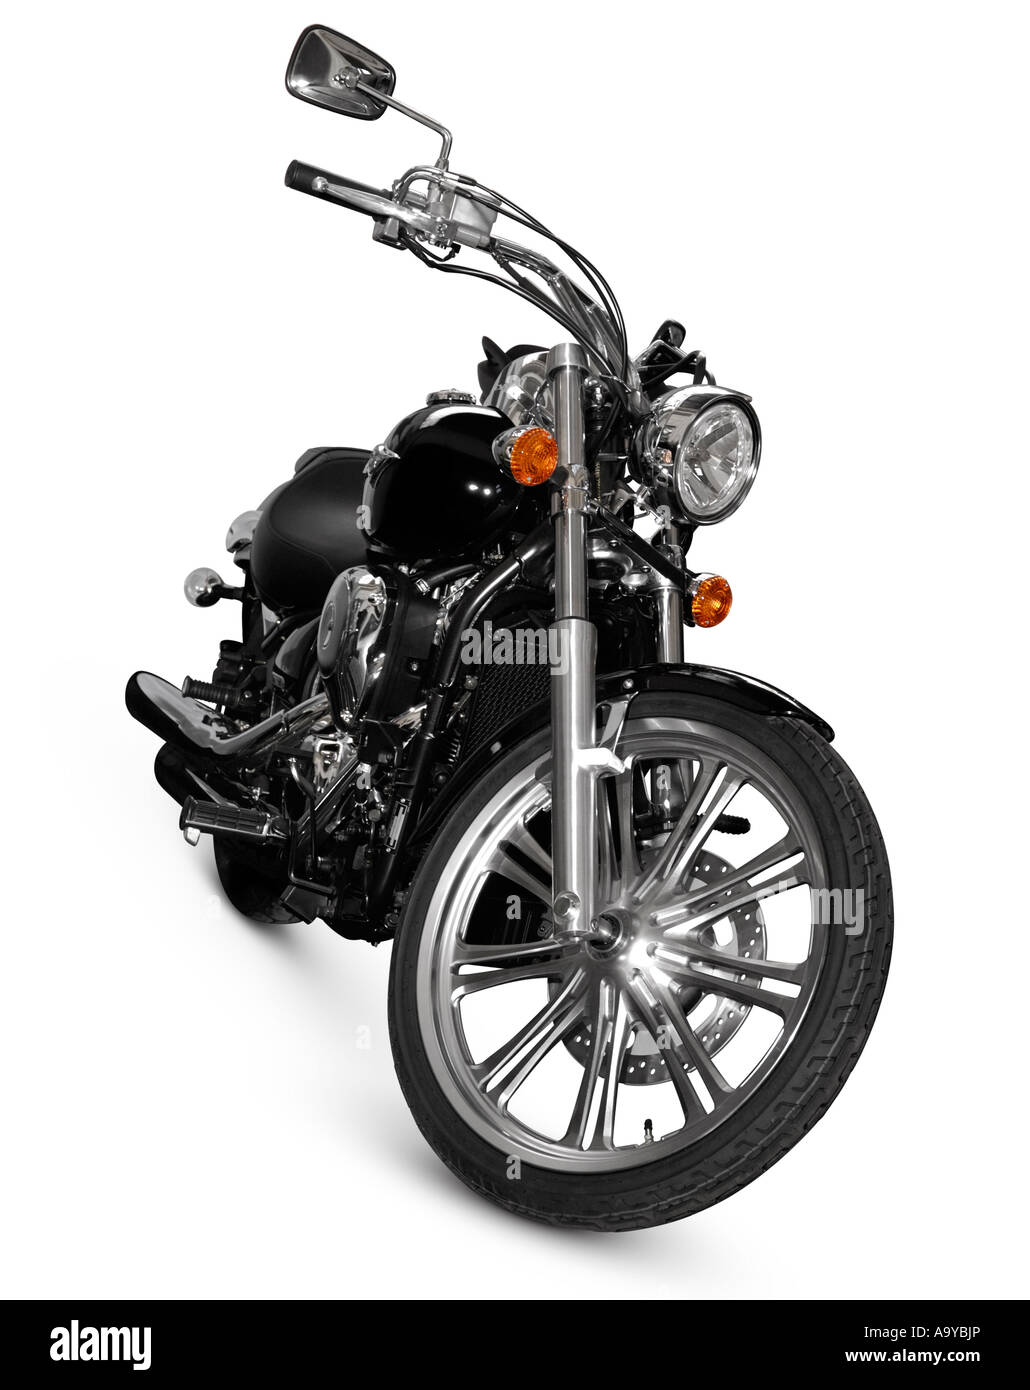 Black Kawasaki Vulcan 900 Custom motorcycle motorbike bike chopper cruiser Isolated on white cutout - Stock Image